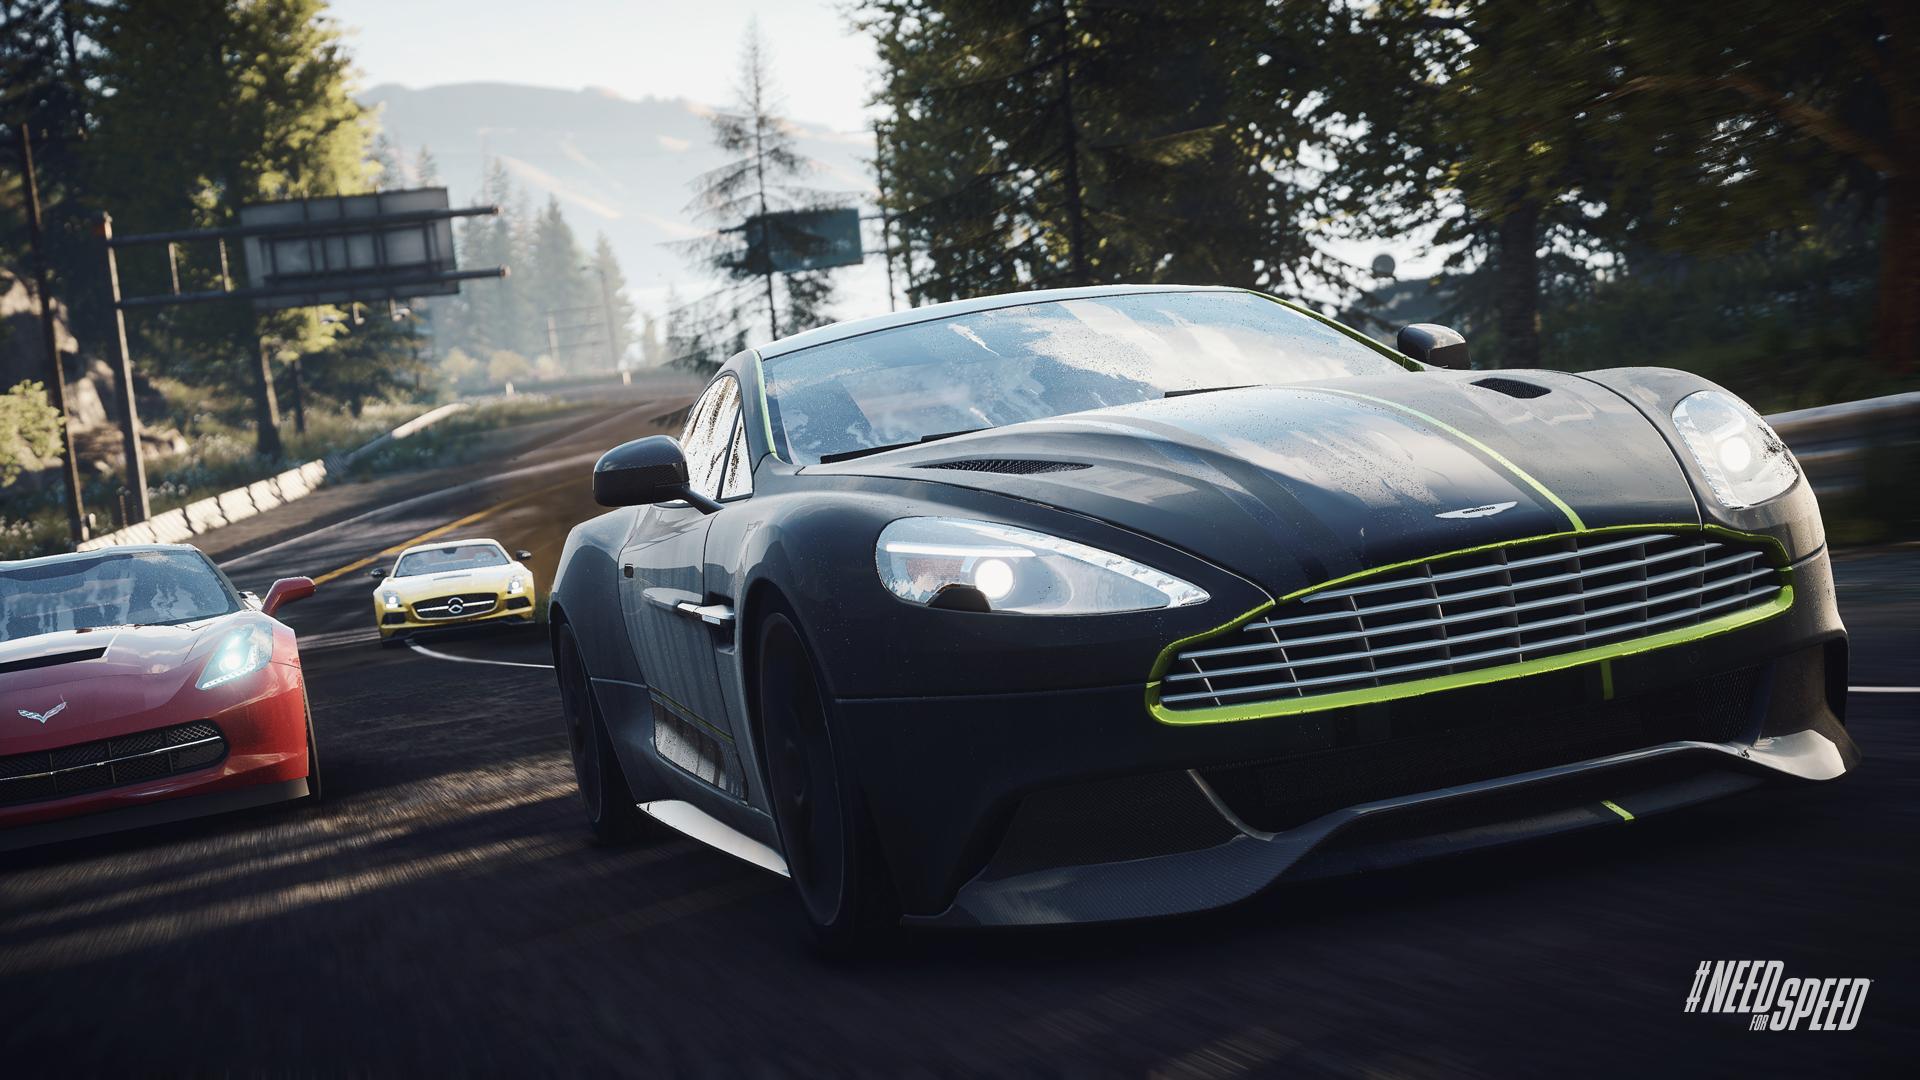 Mclaren F1 Iphone Wallpaper Aston Martin V12 Vantage Hd Wallpaper Background Image